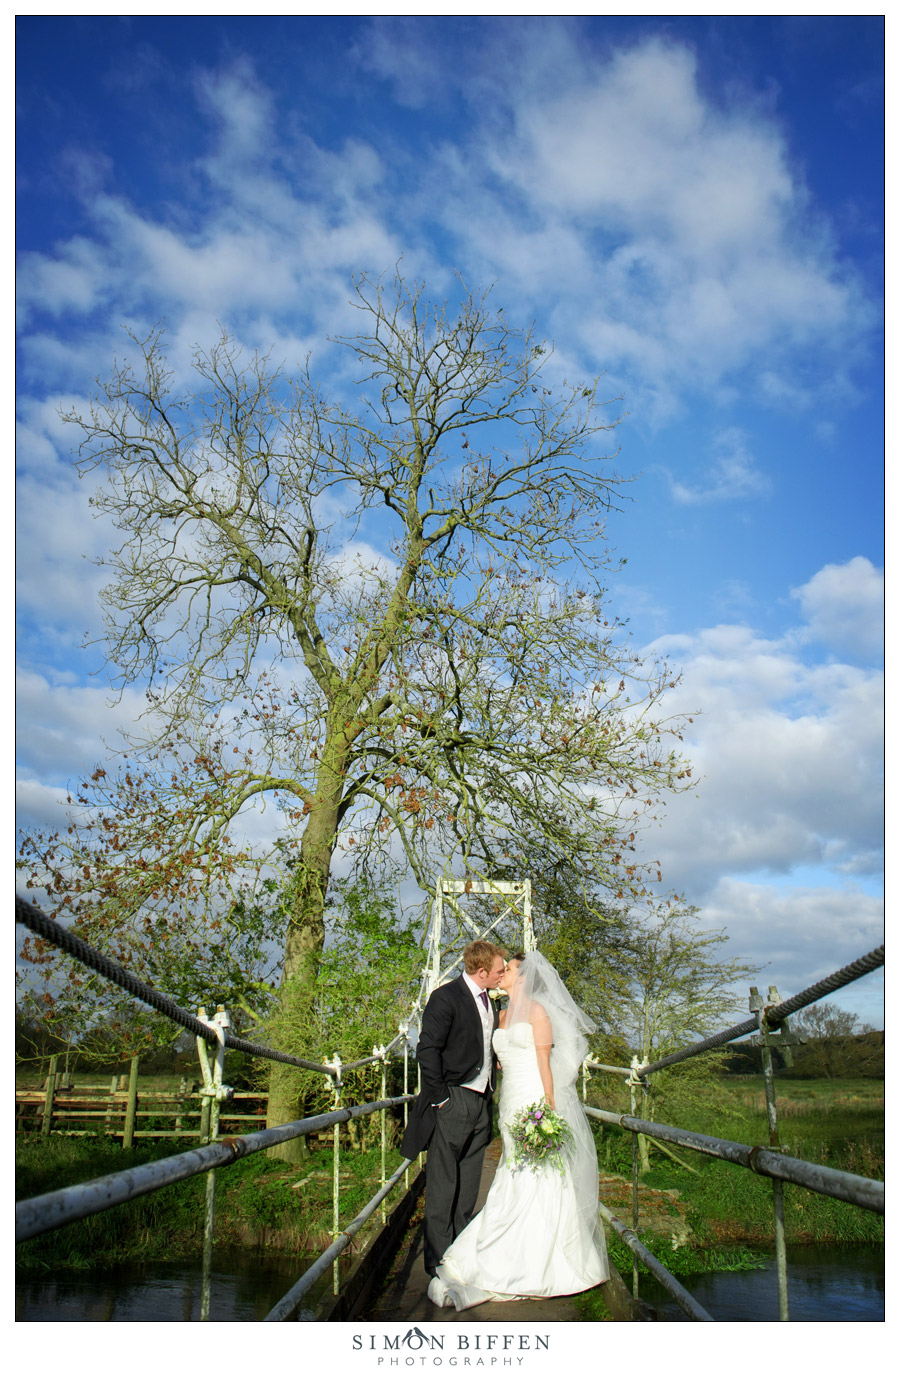 Bride & Groom - Simon Biffen Photography